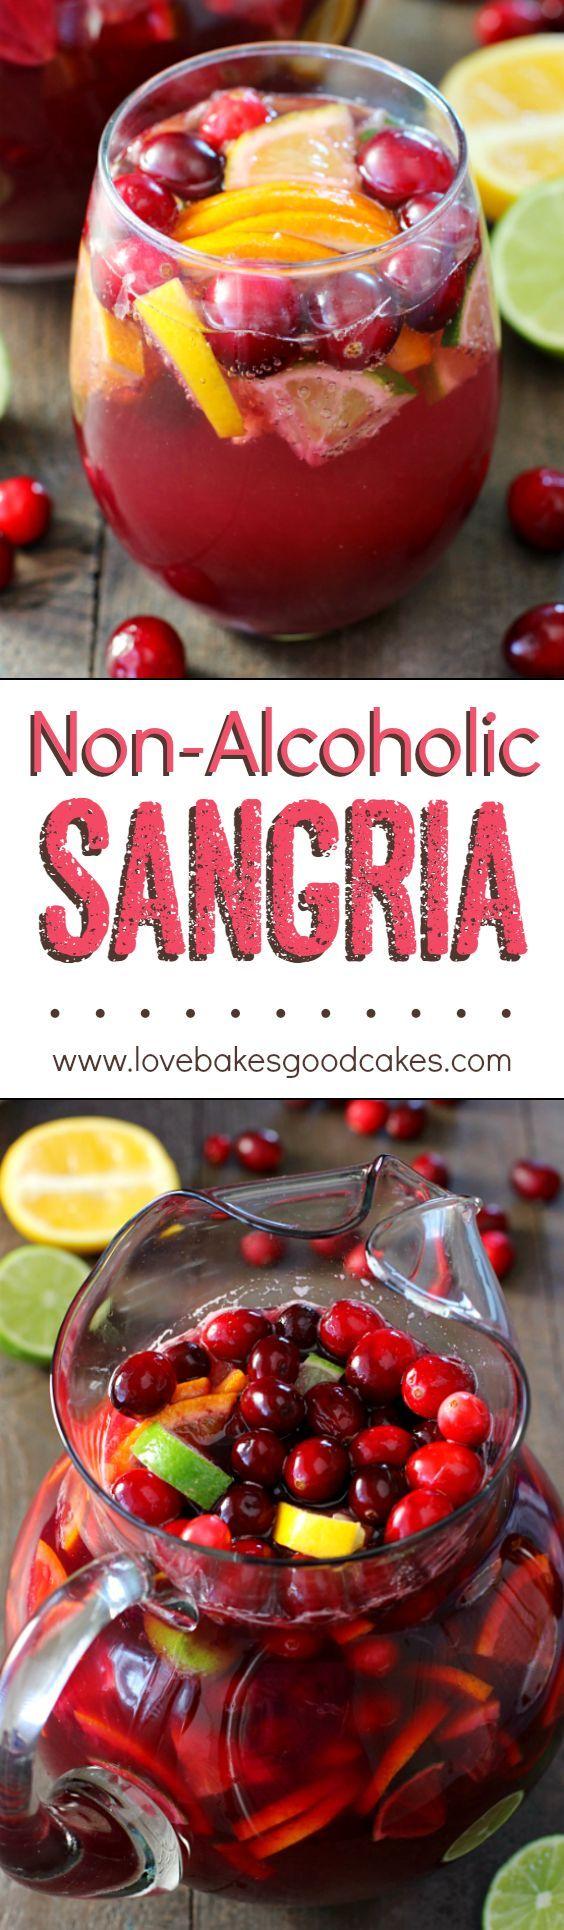 Non Alcoholic Sangria Recipe Drinks Alcohol Recipes Summer Drinks Alcohol Recipes Summer Drink Recipes